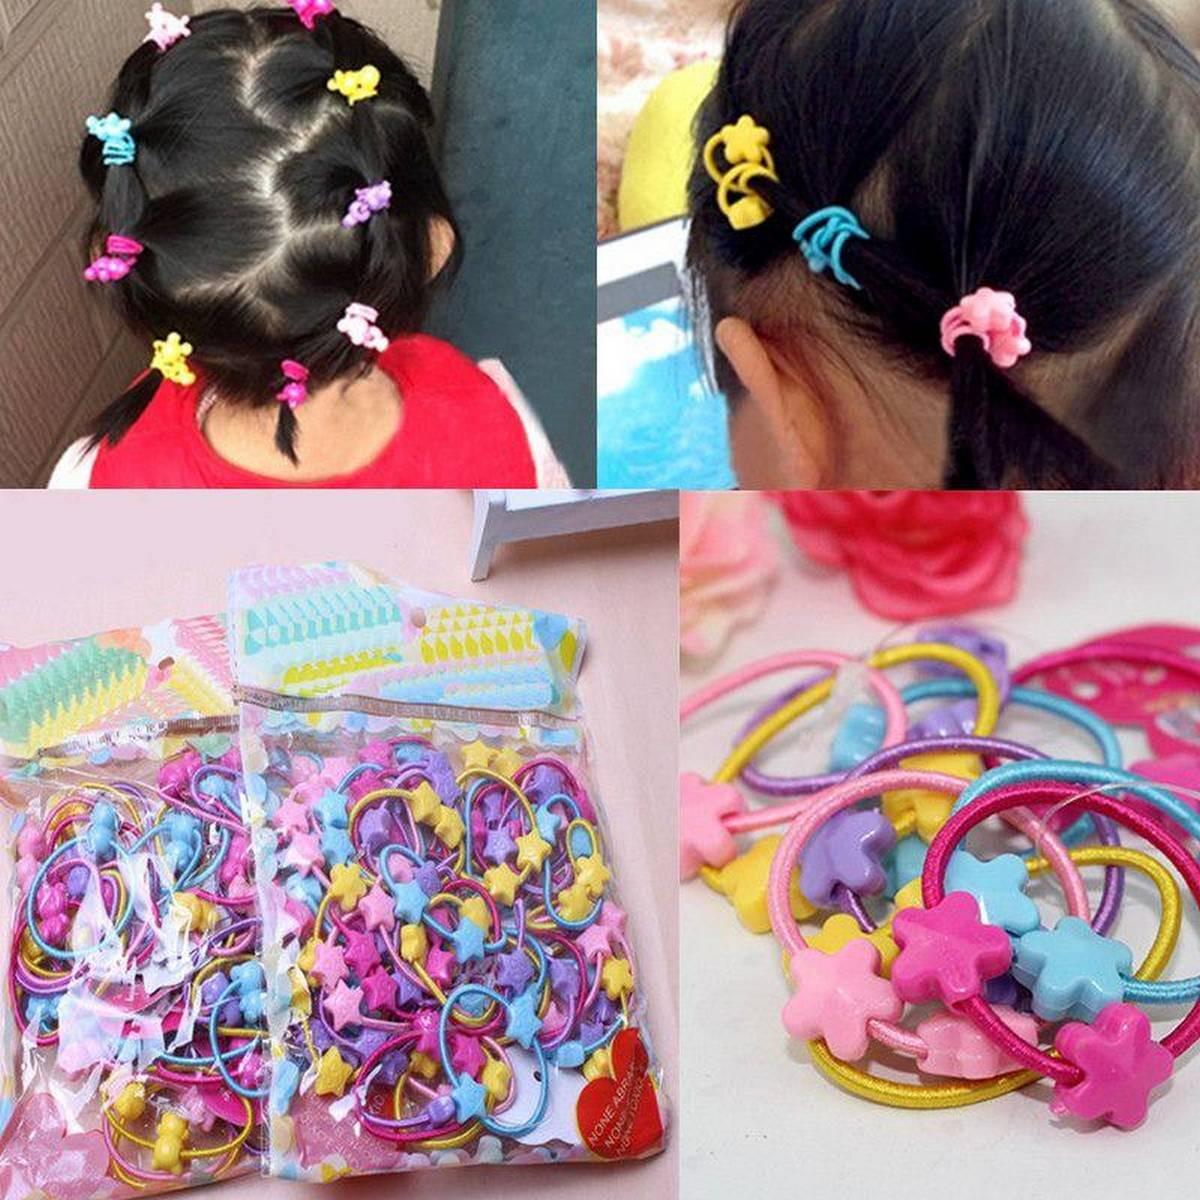 10pcs/Lot Girls Hair Accessories Cute Love Star Candy Elastic Hair Bands Kids Ponytail Holder Rubber Bands Headbands Scrunchie